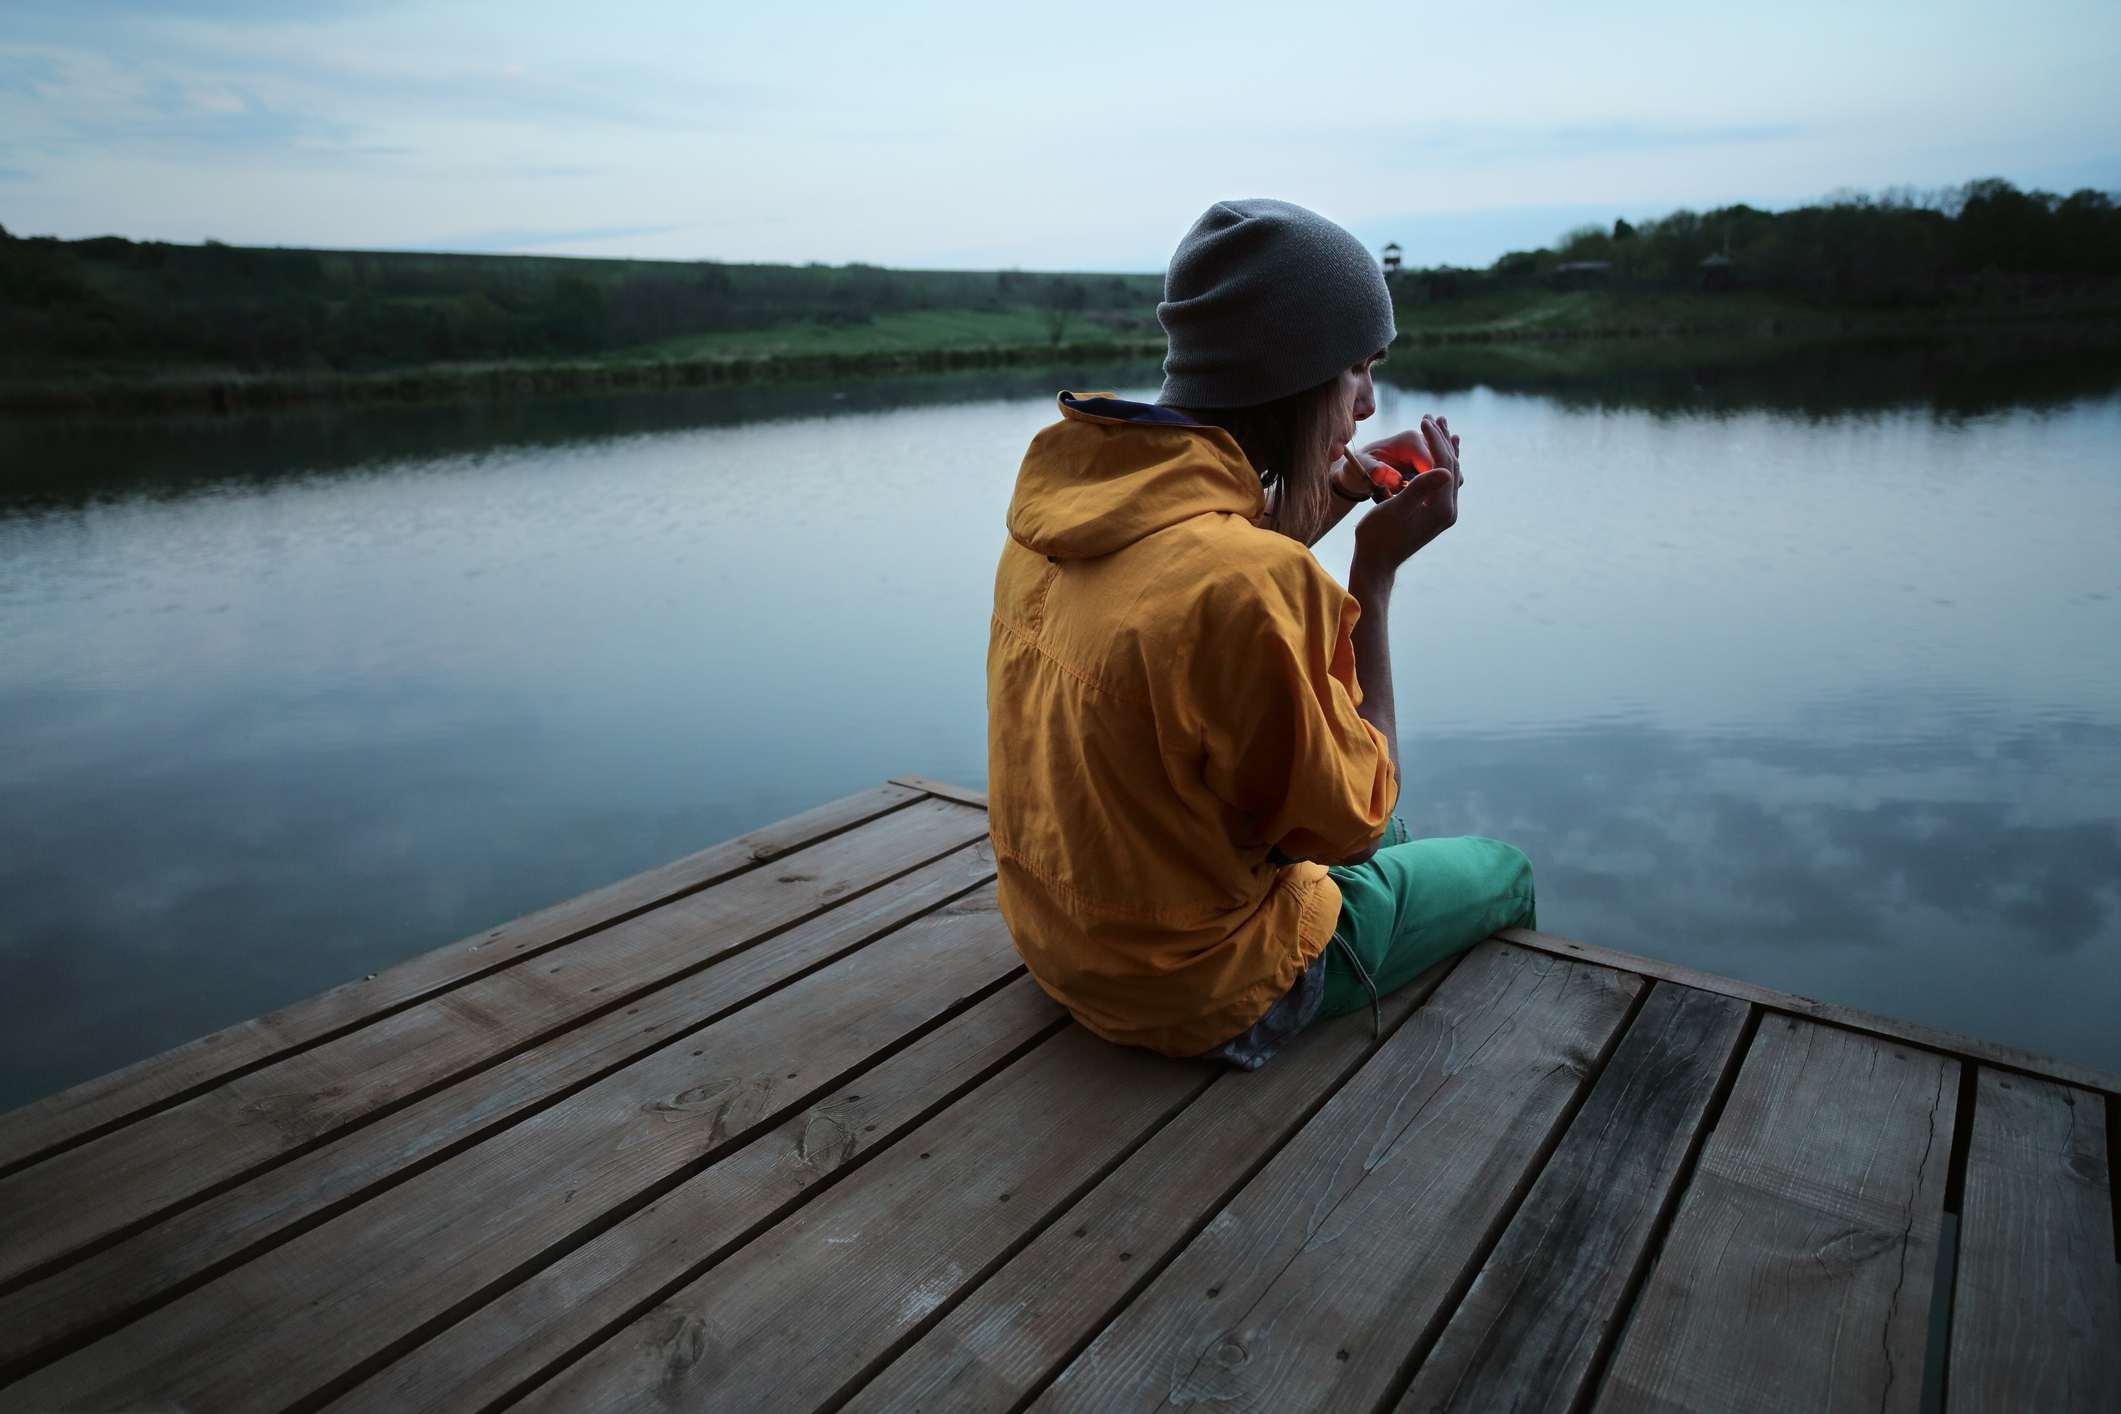 Man smoking on a dock